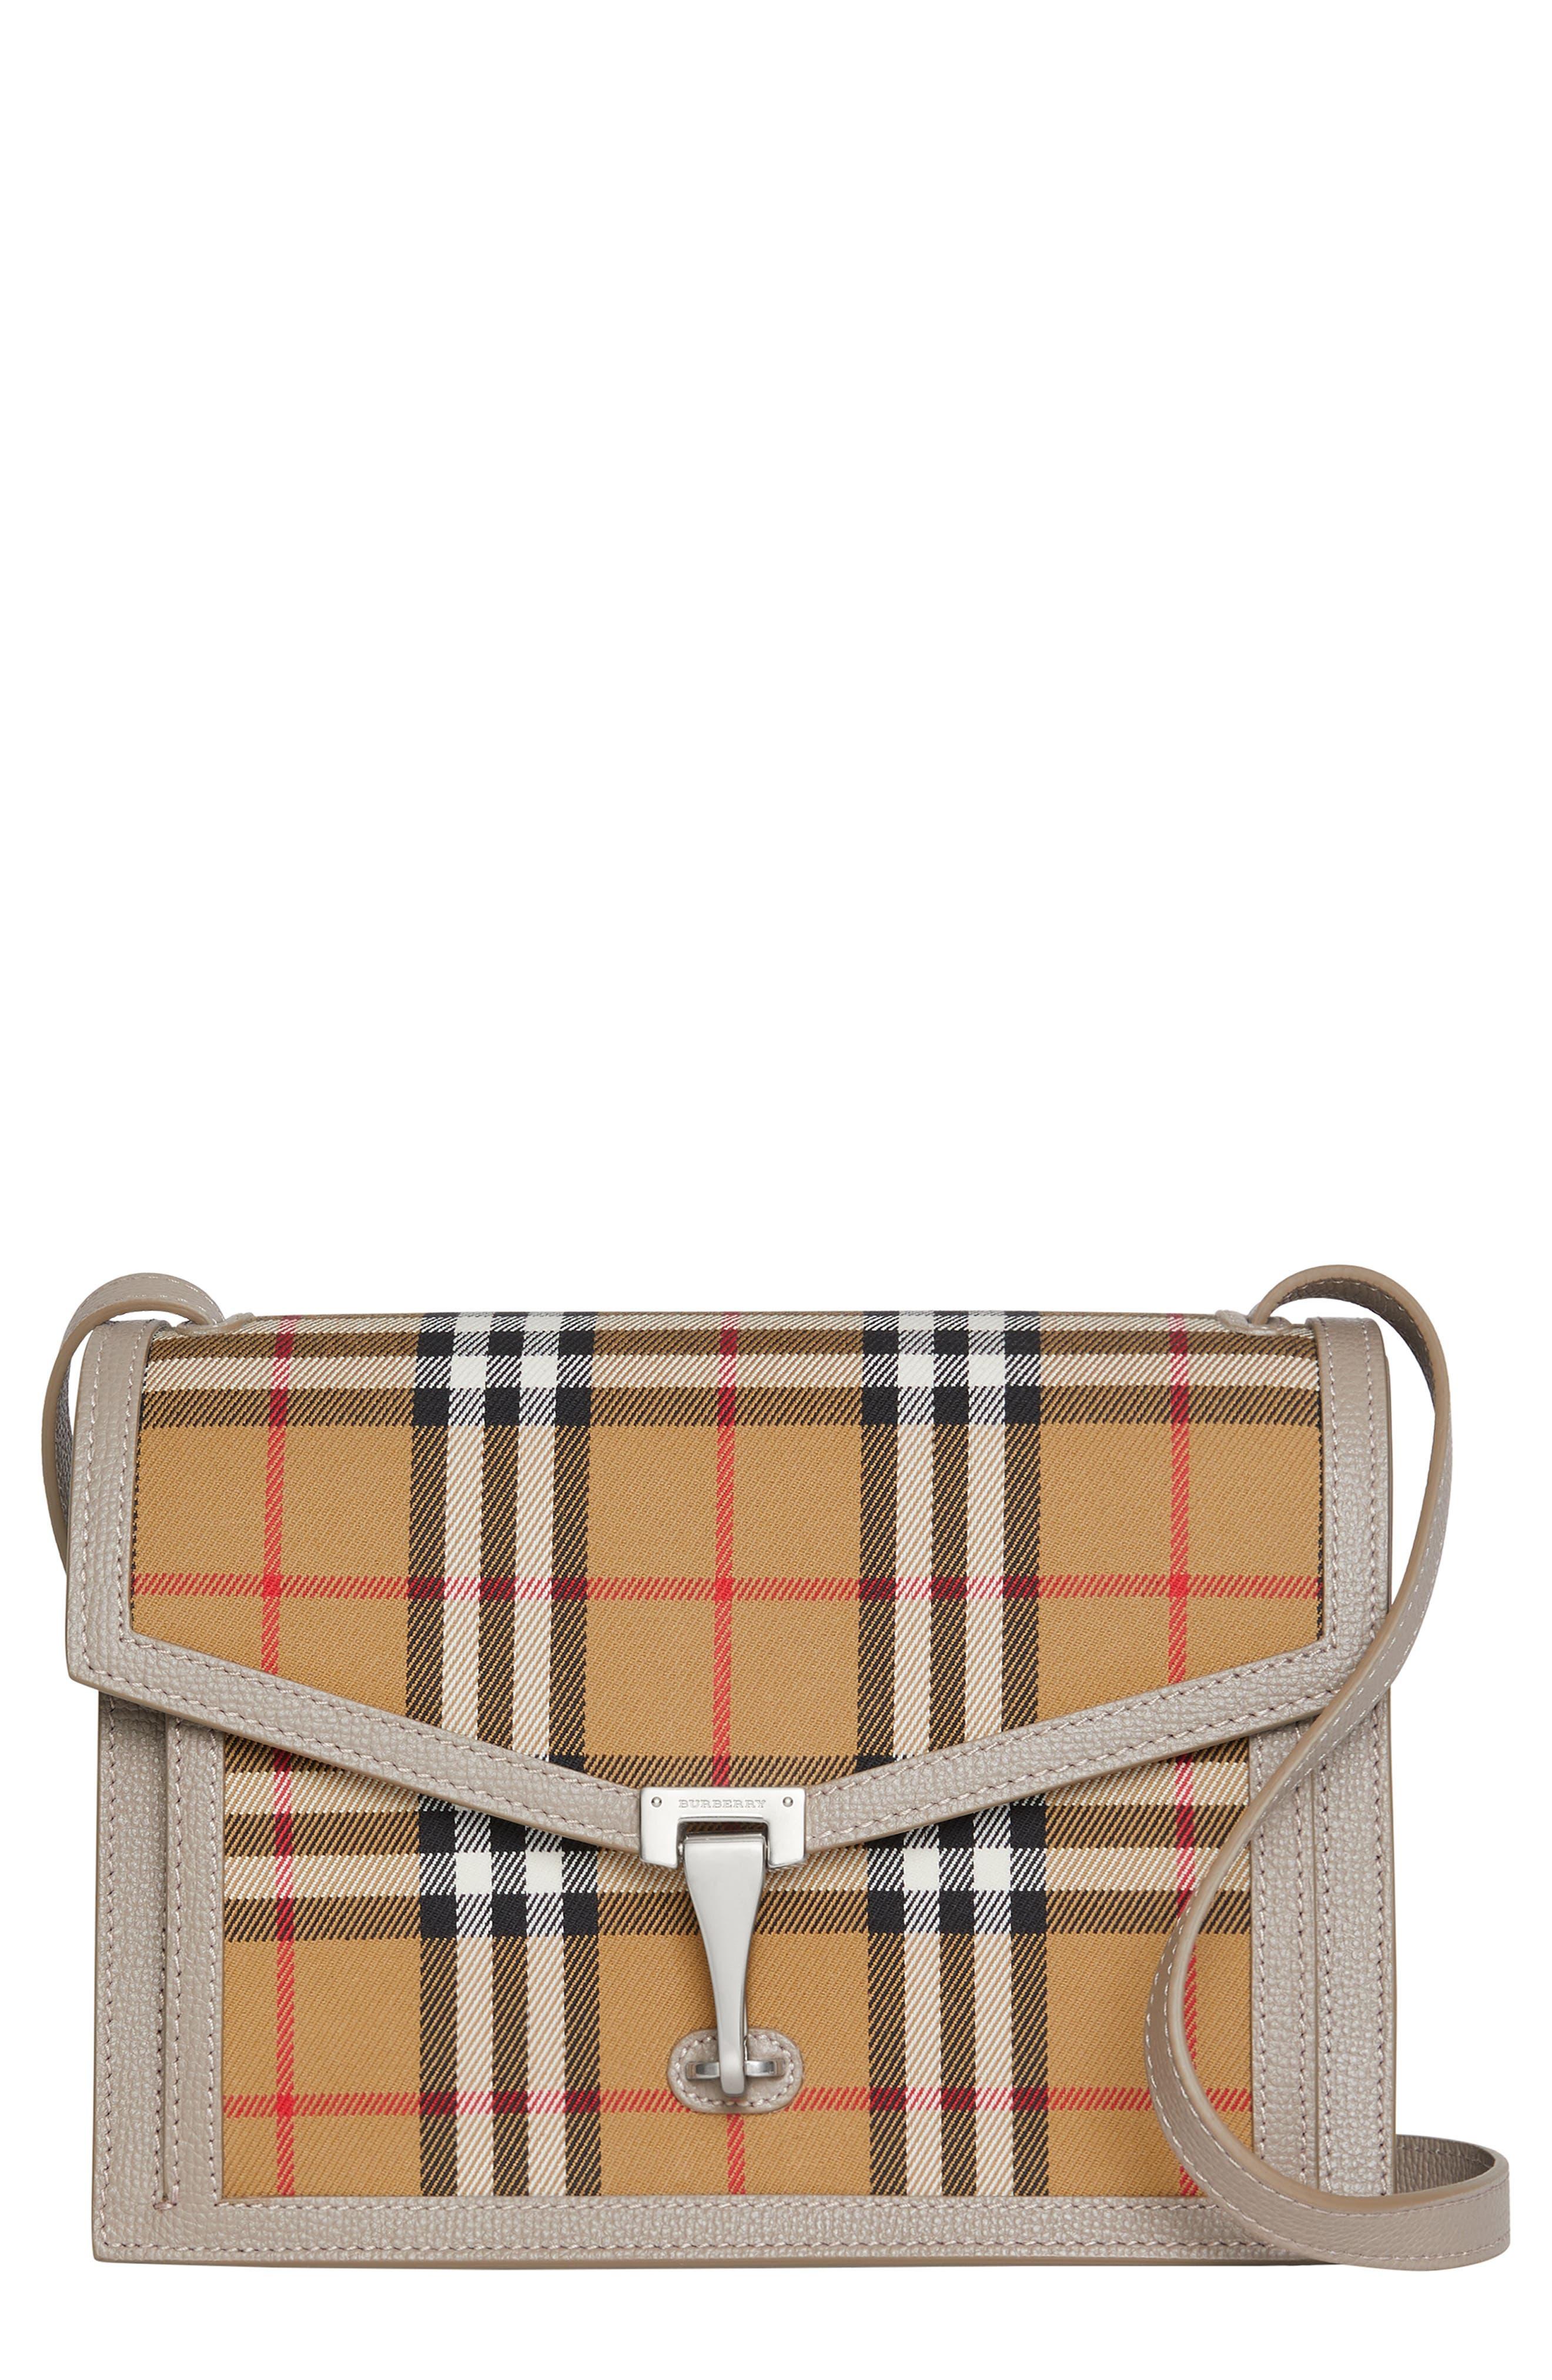 Small Macken Vintage Check Crossbody Bag,                             Main thumbnail 1, color,                             TAUPE BROWN